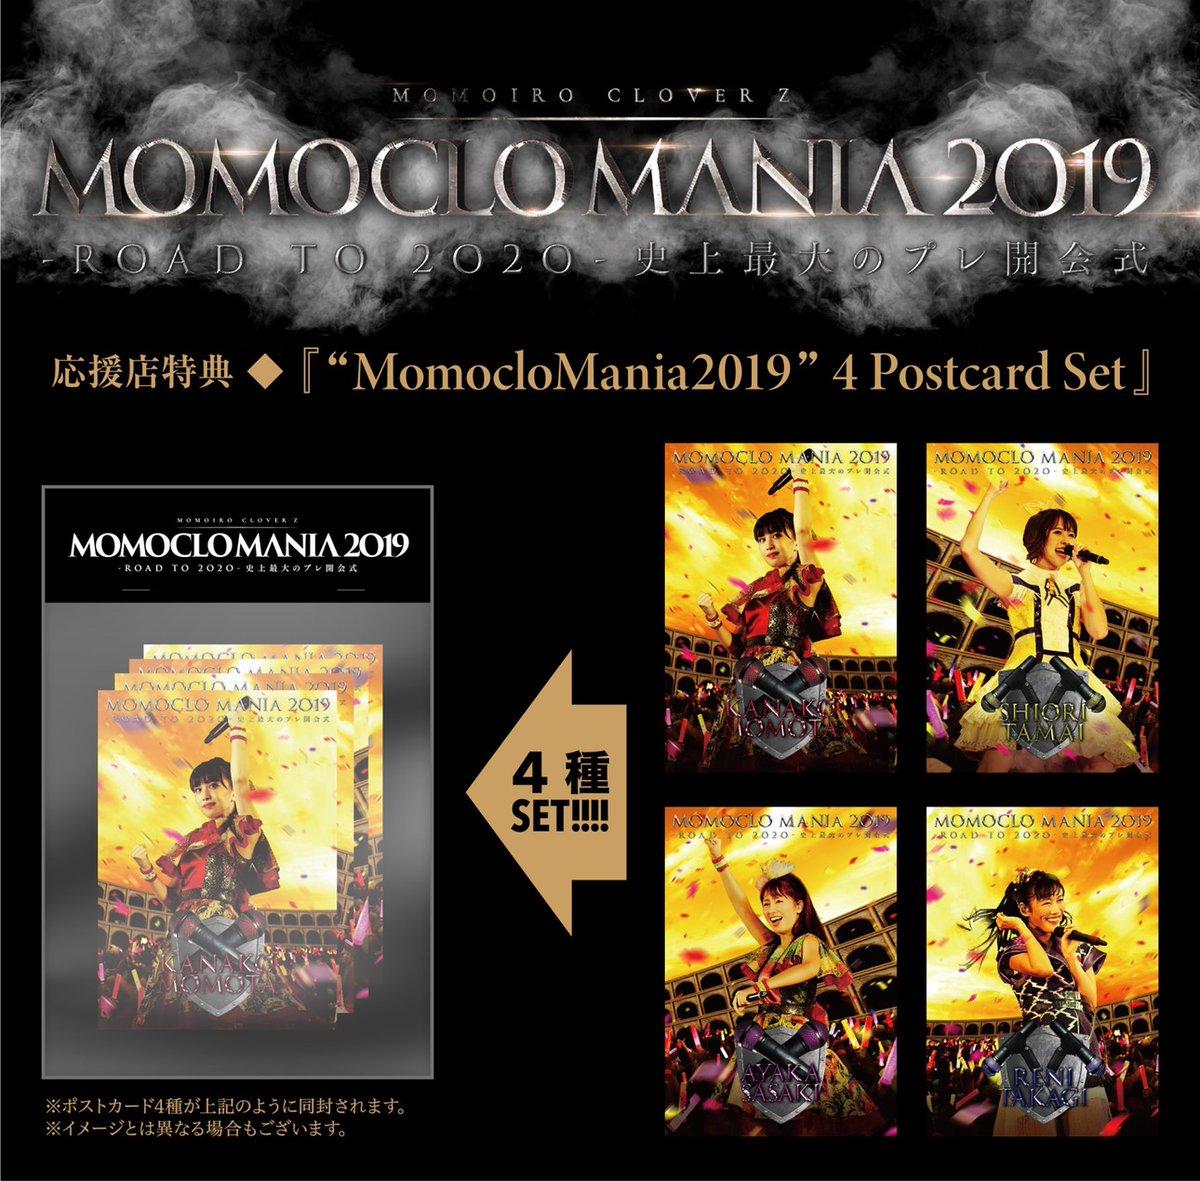 "NEWS ーーーーーーーーーーーー 2/26発売  BD&DVD ーーーーーーーーーーーー 応援店特典も決定  ""MomocloMania2019""  4 Postcard Set  メン… https://t.co/zZpxmiwI73"